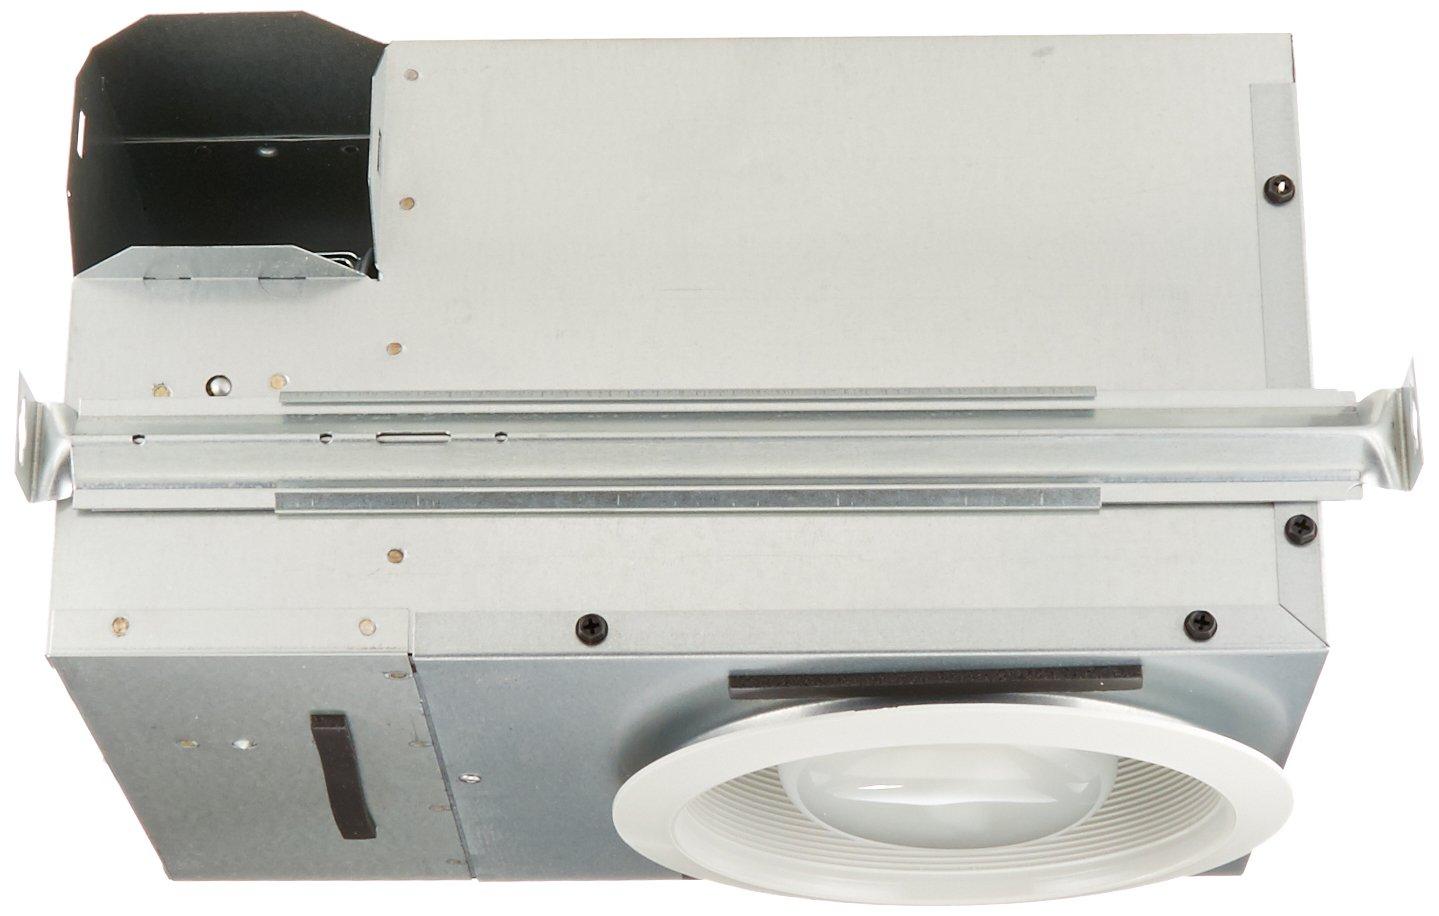 Broan 744FL Recessed Fluorescent Bulb Fan and Light, 70 CFM 14 Watt 4-Pin R30